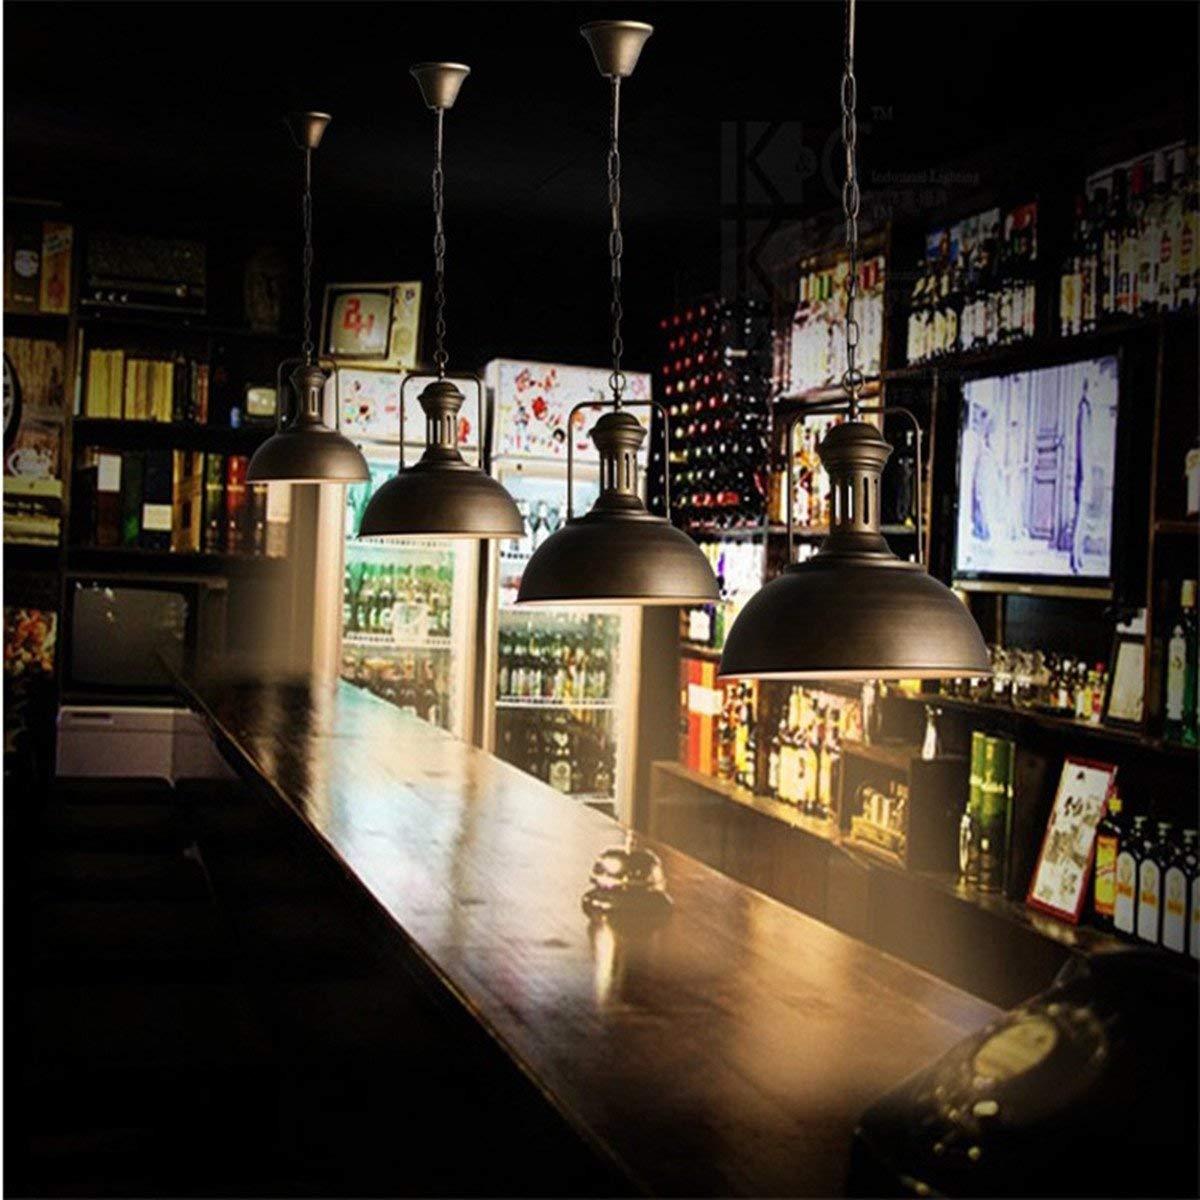 L/ámpara Industrial Retra Pantallas Luz de Techo R/ústica Pantalla Lampshade Pendant de Metal Interfaz E27 para Bar Cafeter/ía Cocina Desv/án Restaurante AOGUERBE Iluminaci/ón Colgante Vintage Herrumbre